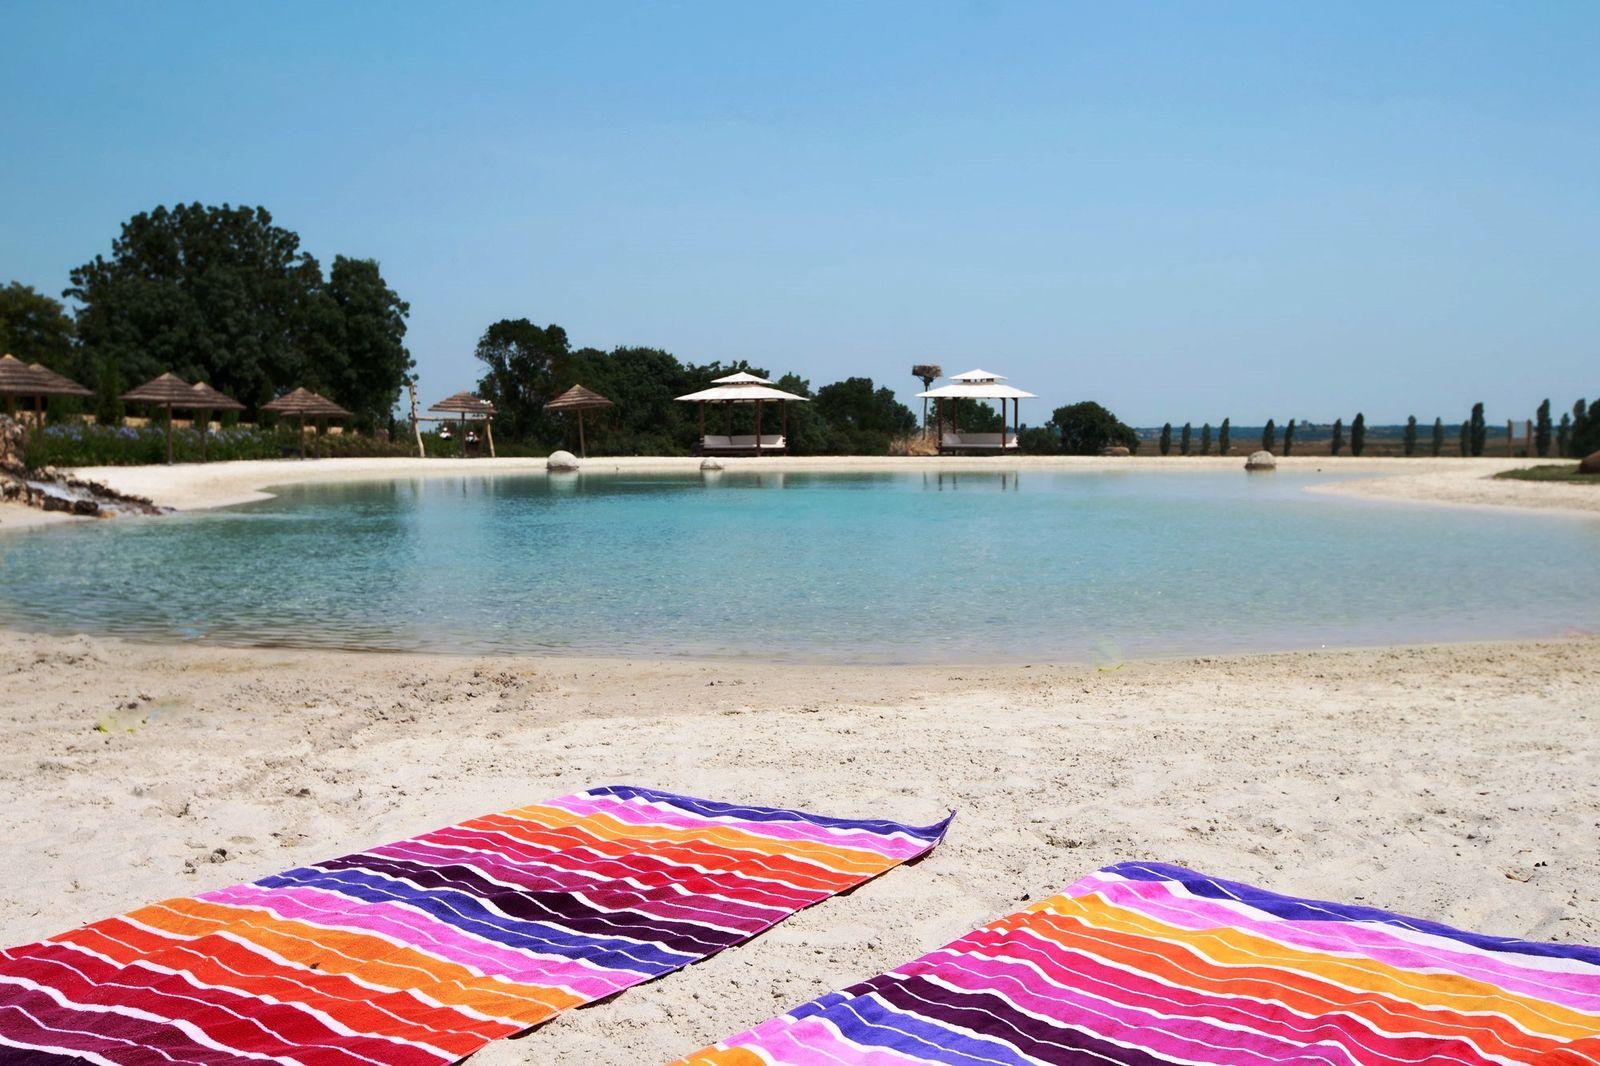 Afbeelding van Domaine les Marées - 5. Le Lac des Cygnes - luxe vakantievilla Frankrijk